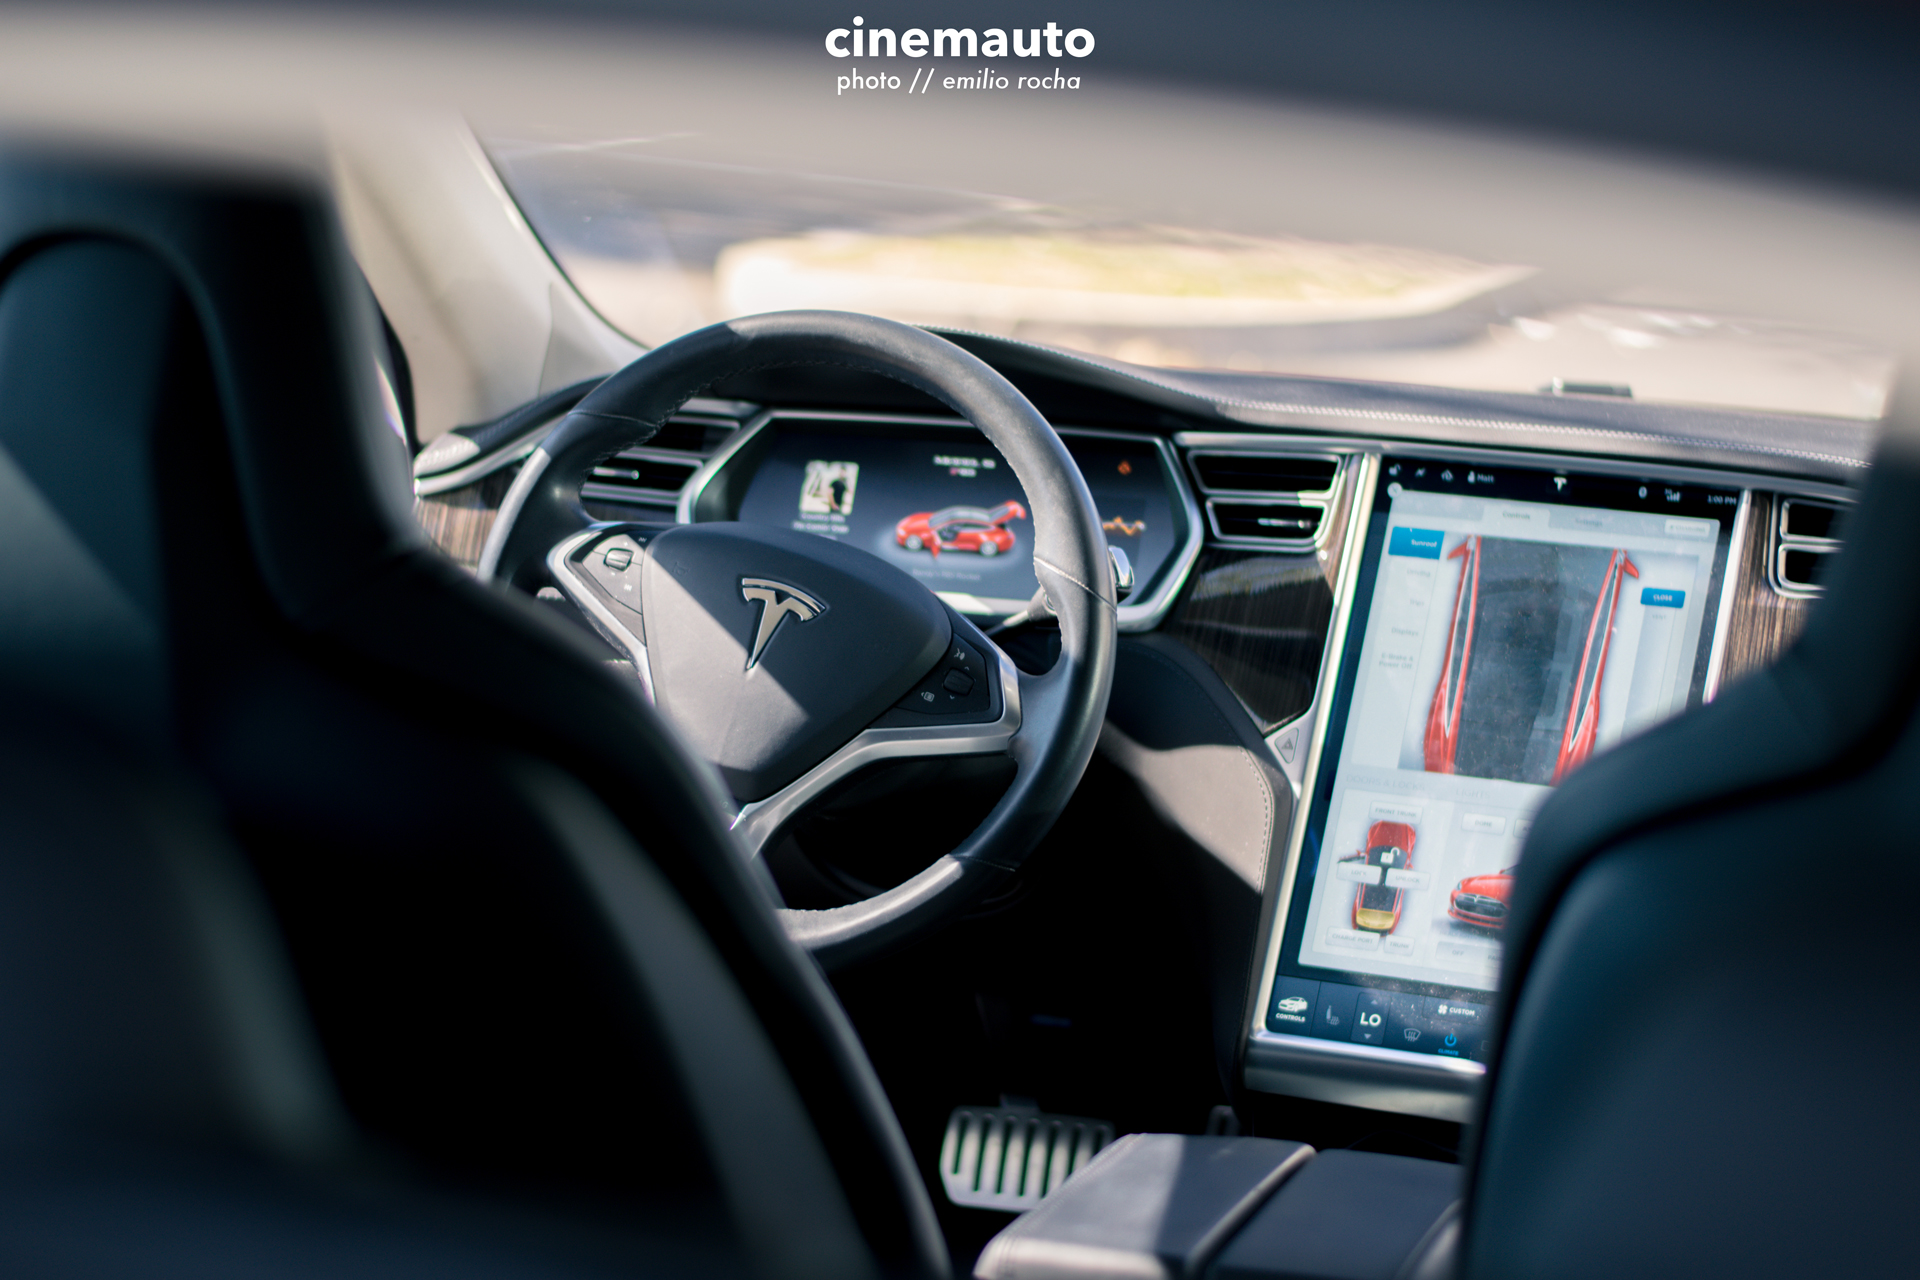 TeslaCinemauto-23.jpg